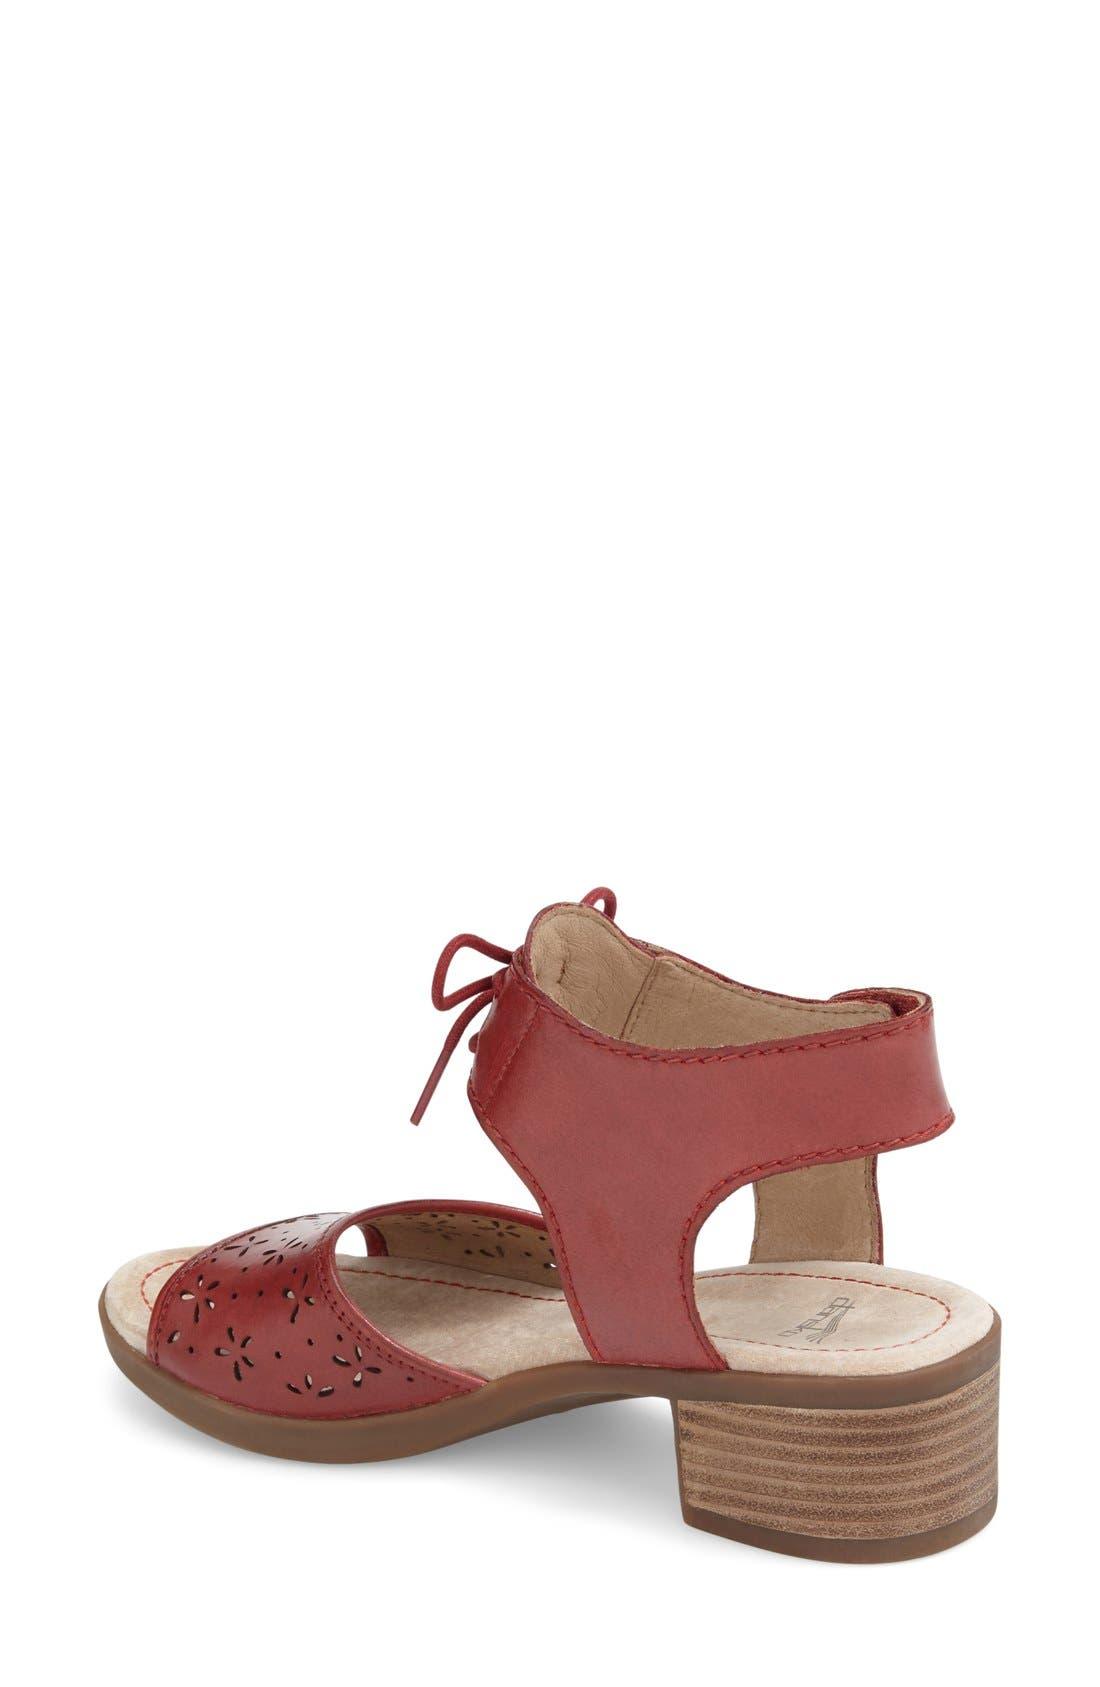 'Liz' Lace-Up Block Heel Sandal,                             Alternate thumbnail 2, color,                             Red Antiqued Leather